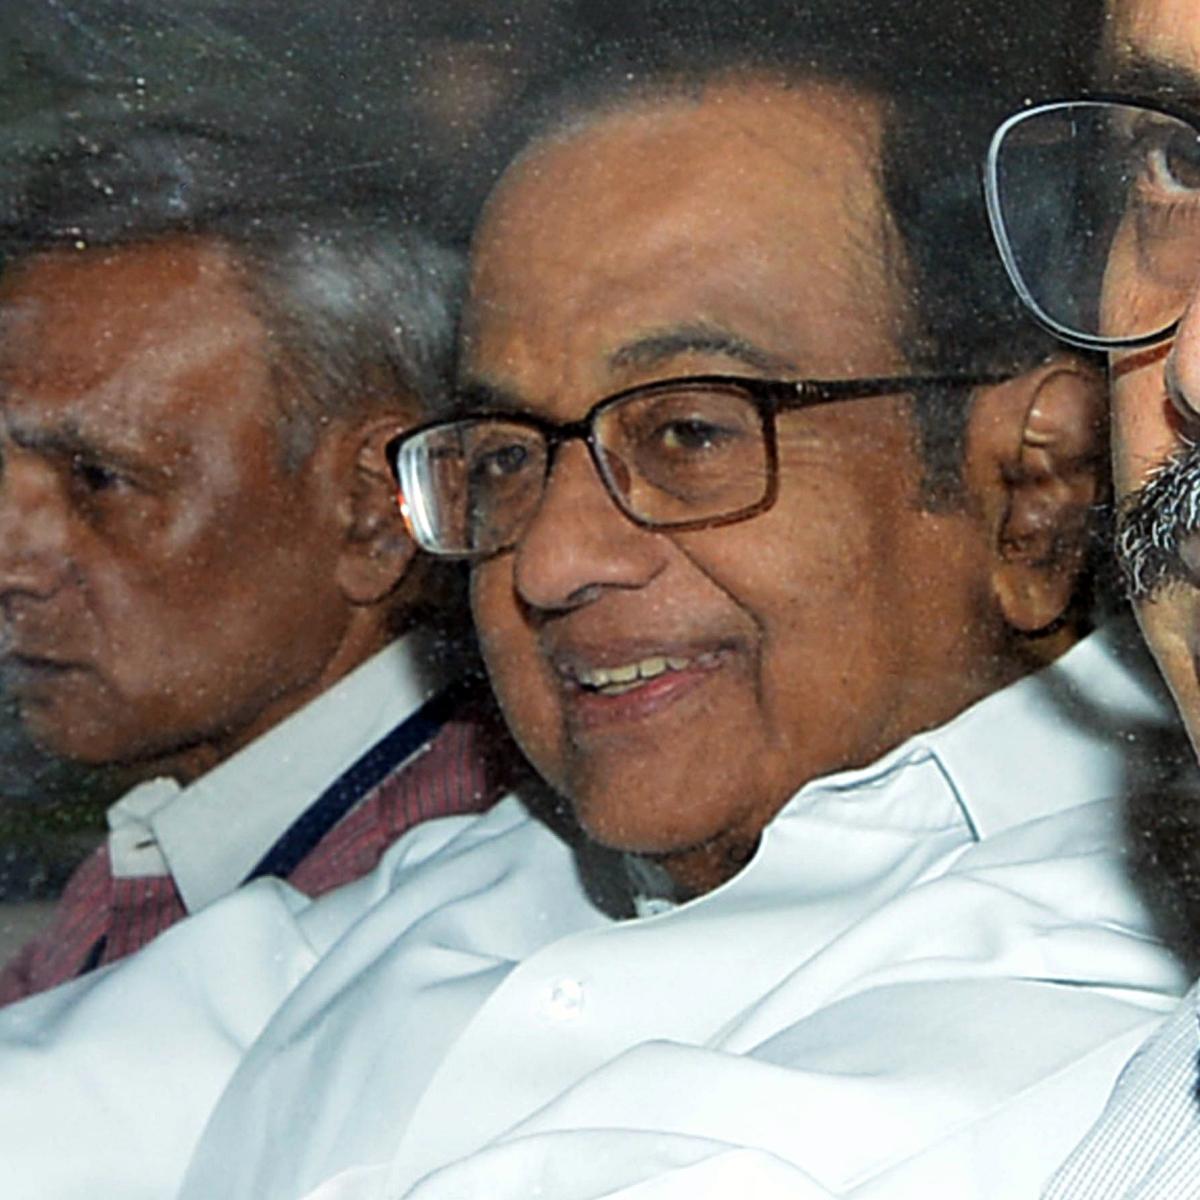 Latest News! SC extends interim protection from arrest to Chidambaram till September 5 in INX Media case